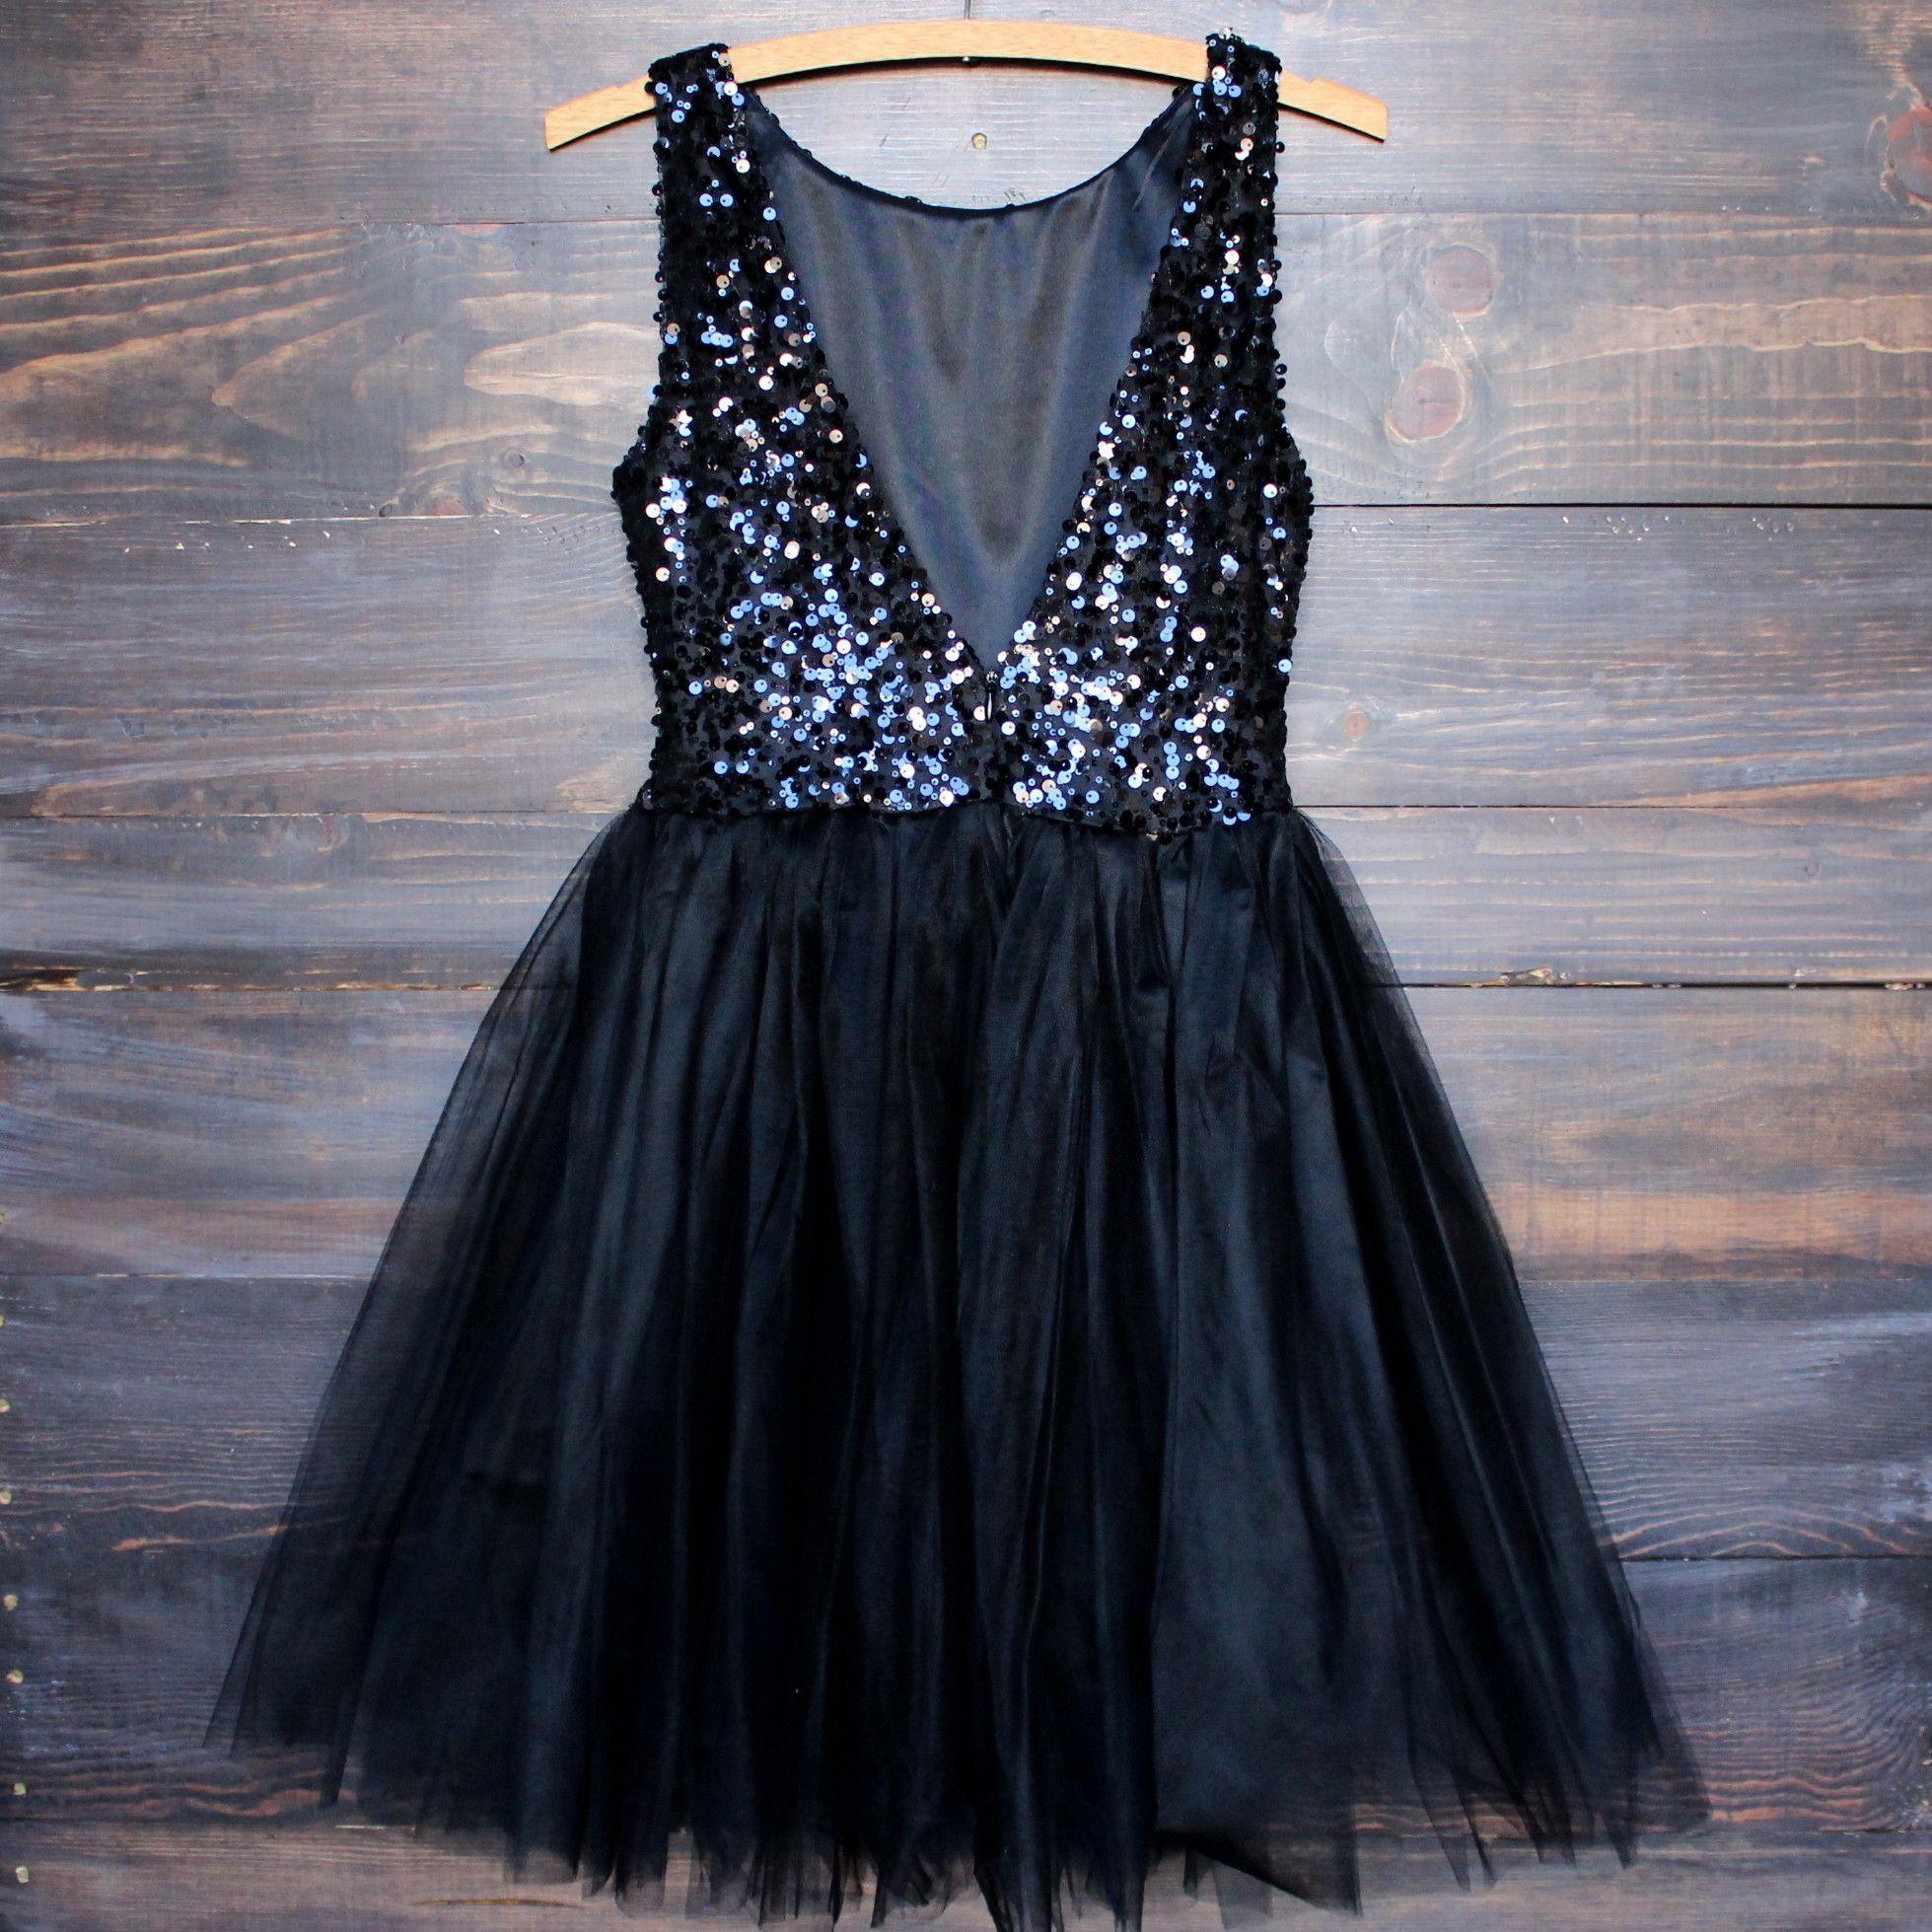 Sugar plum dazzling black sequin darling party dress prom